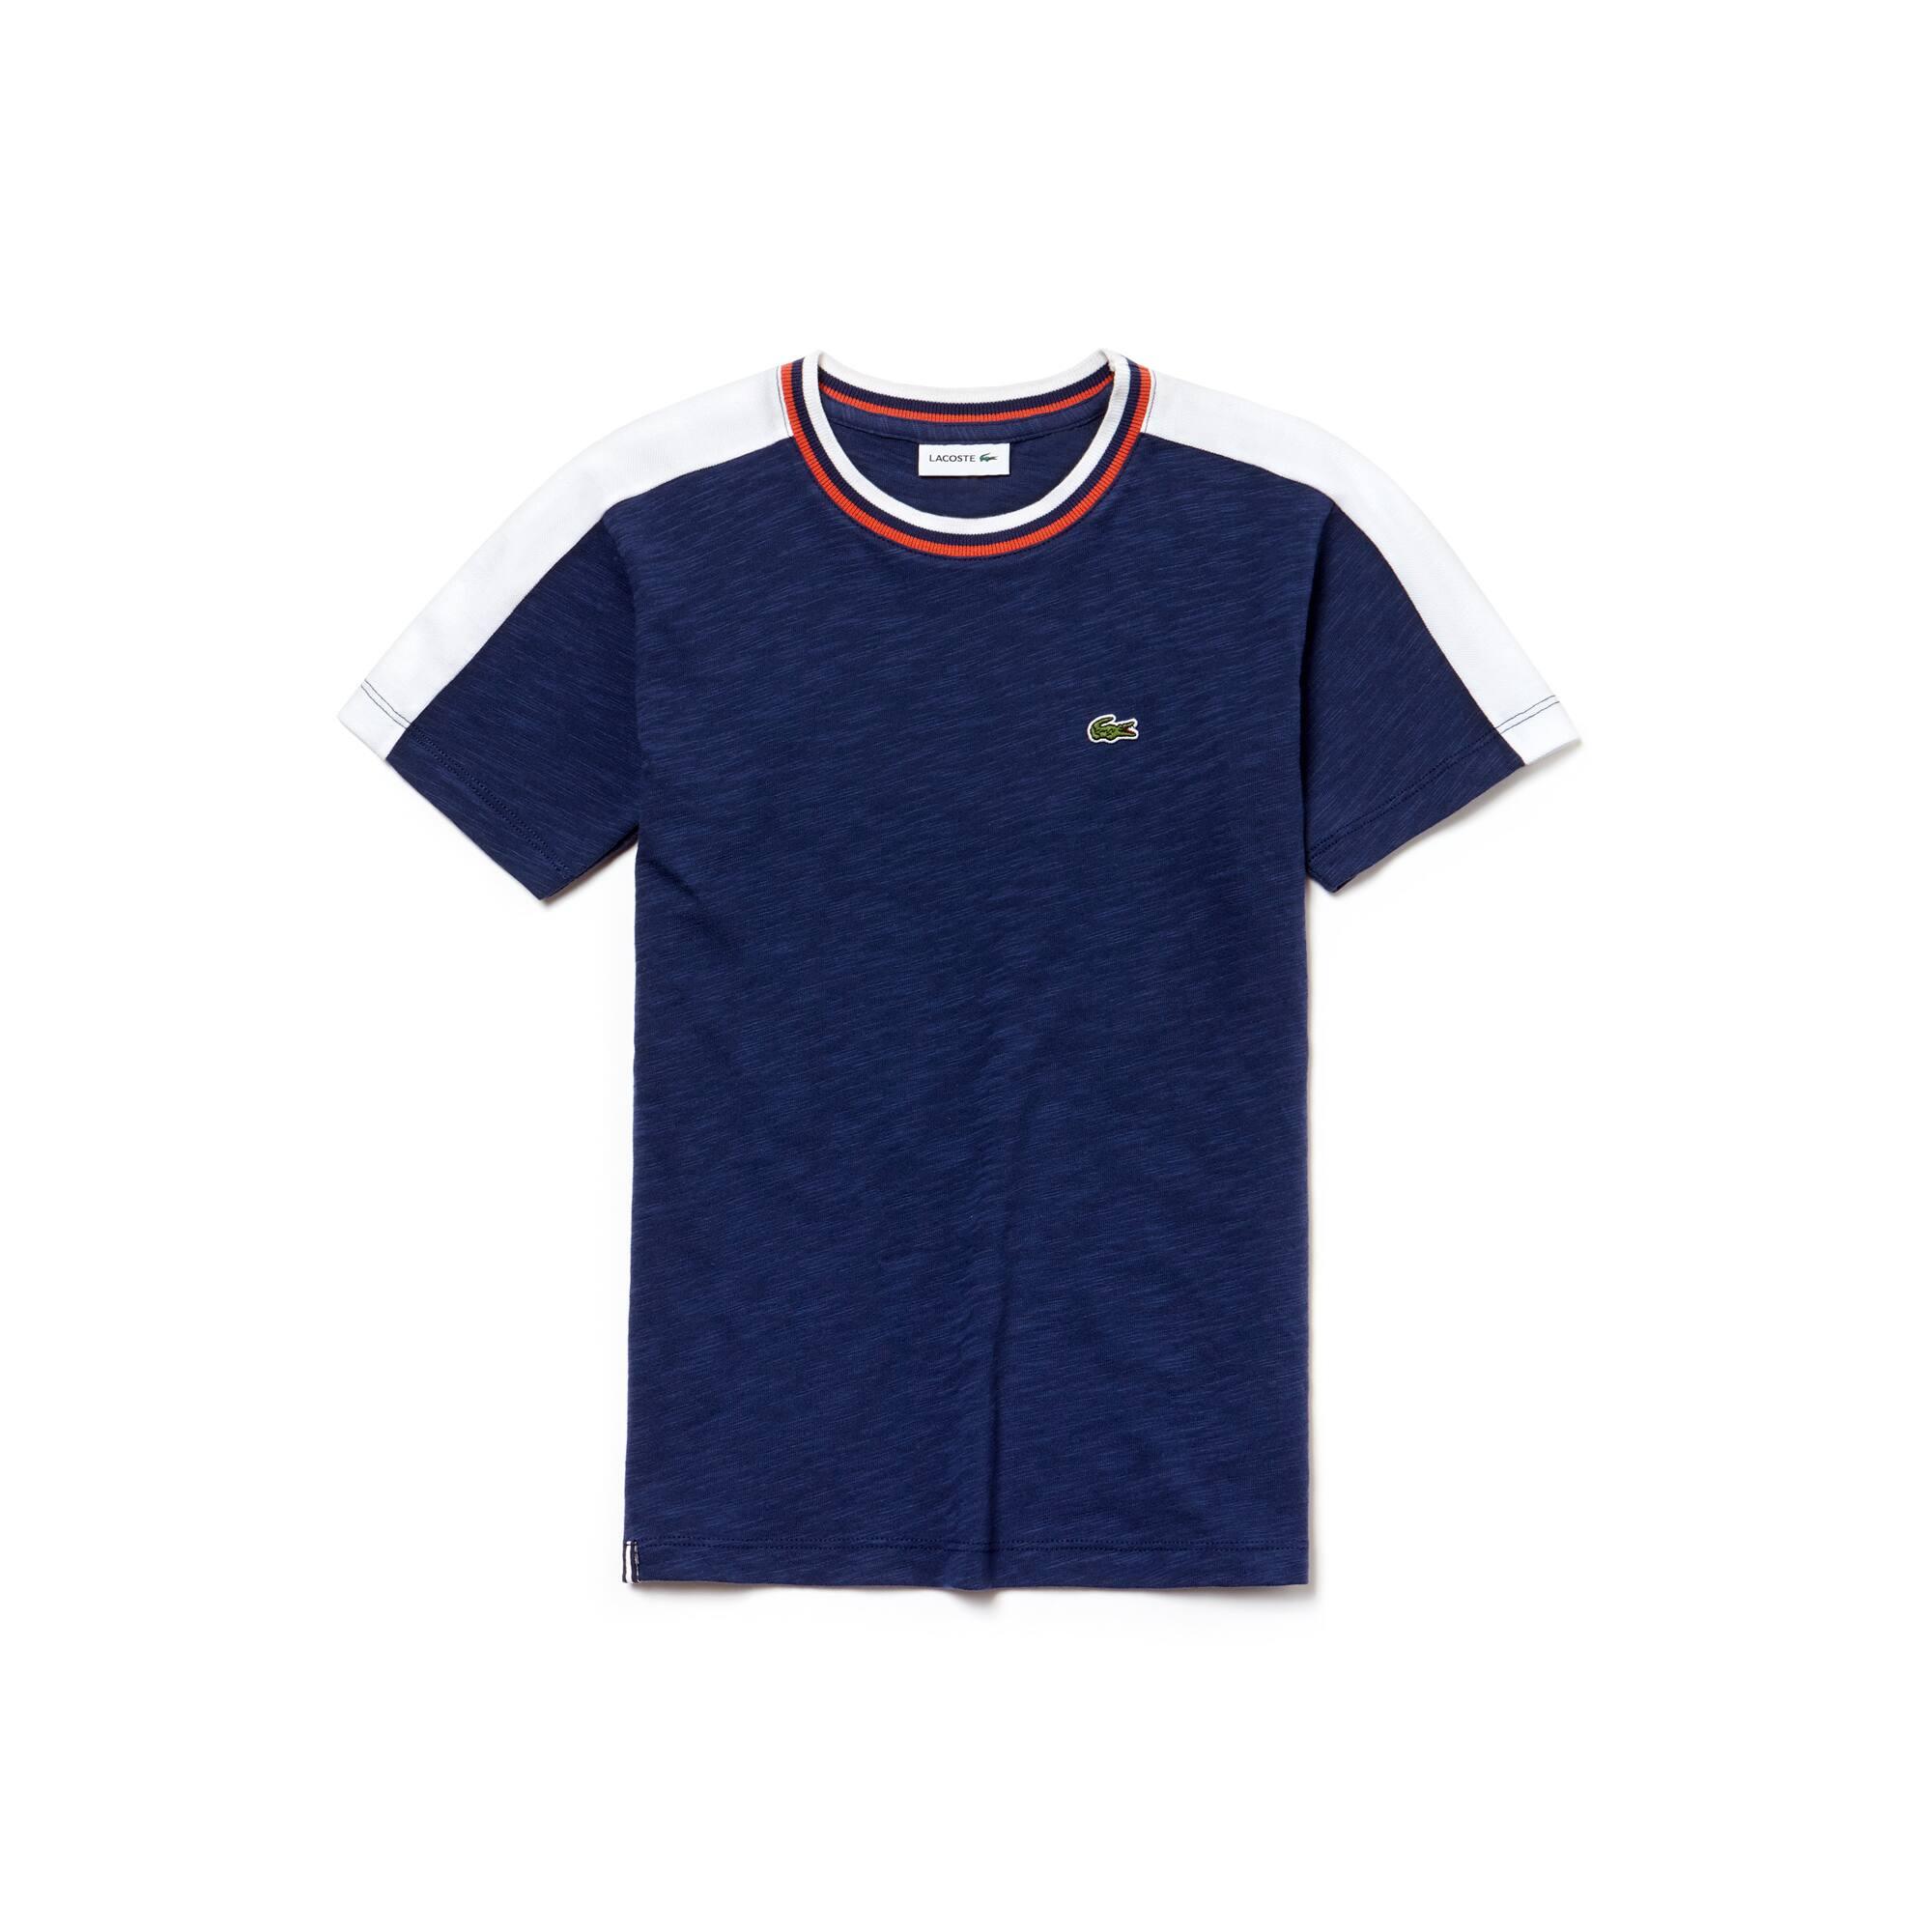 Jungen-T-Shirt aus weichem Jersey im Colorblock-Design